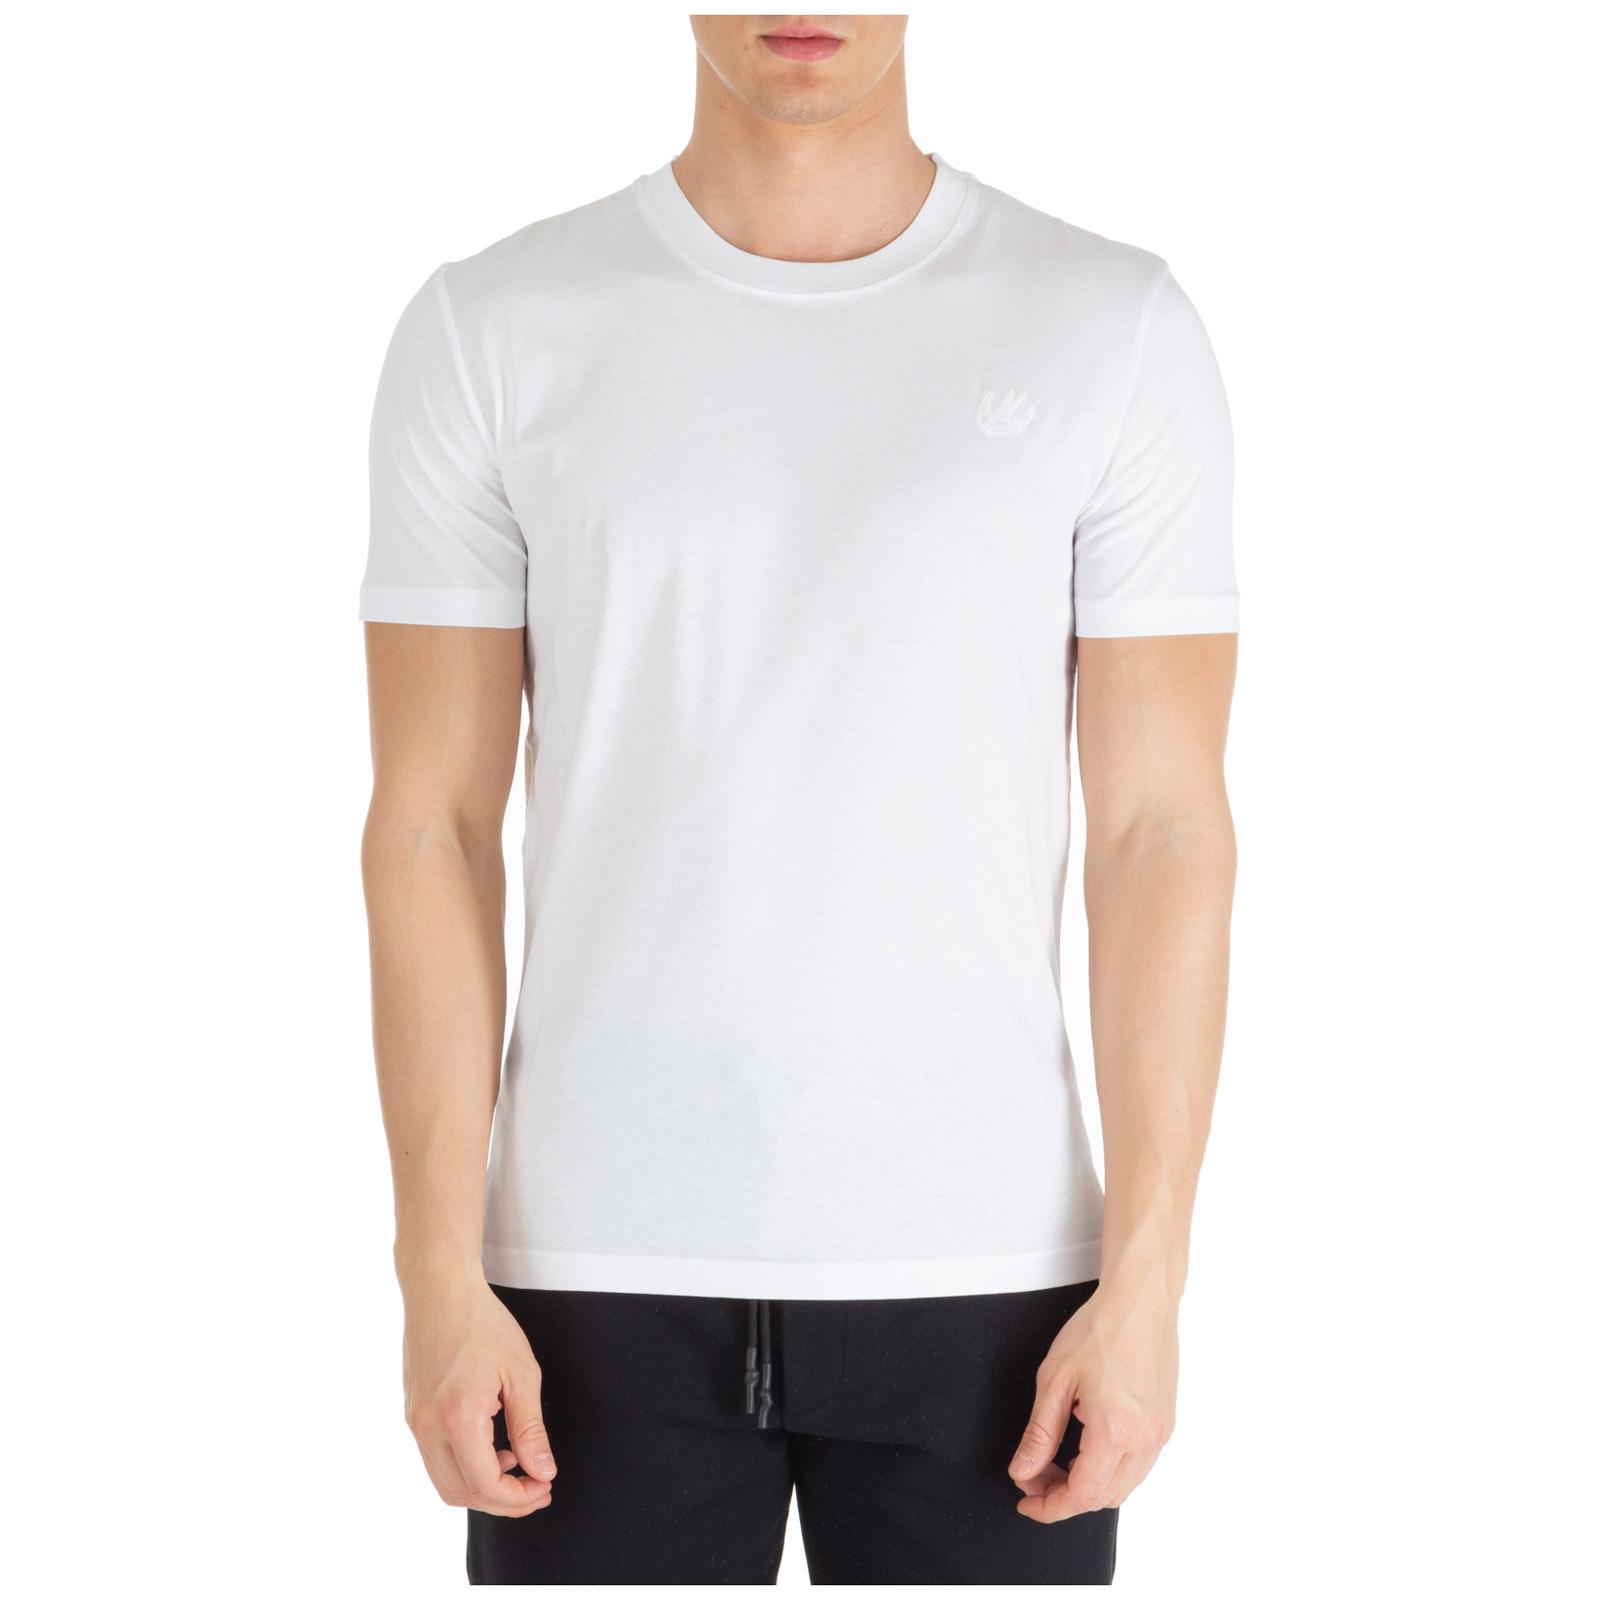 Men's short sleeve t-shirt crew neckline jumper swallow